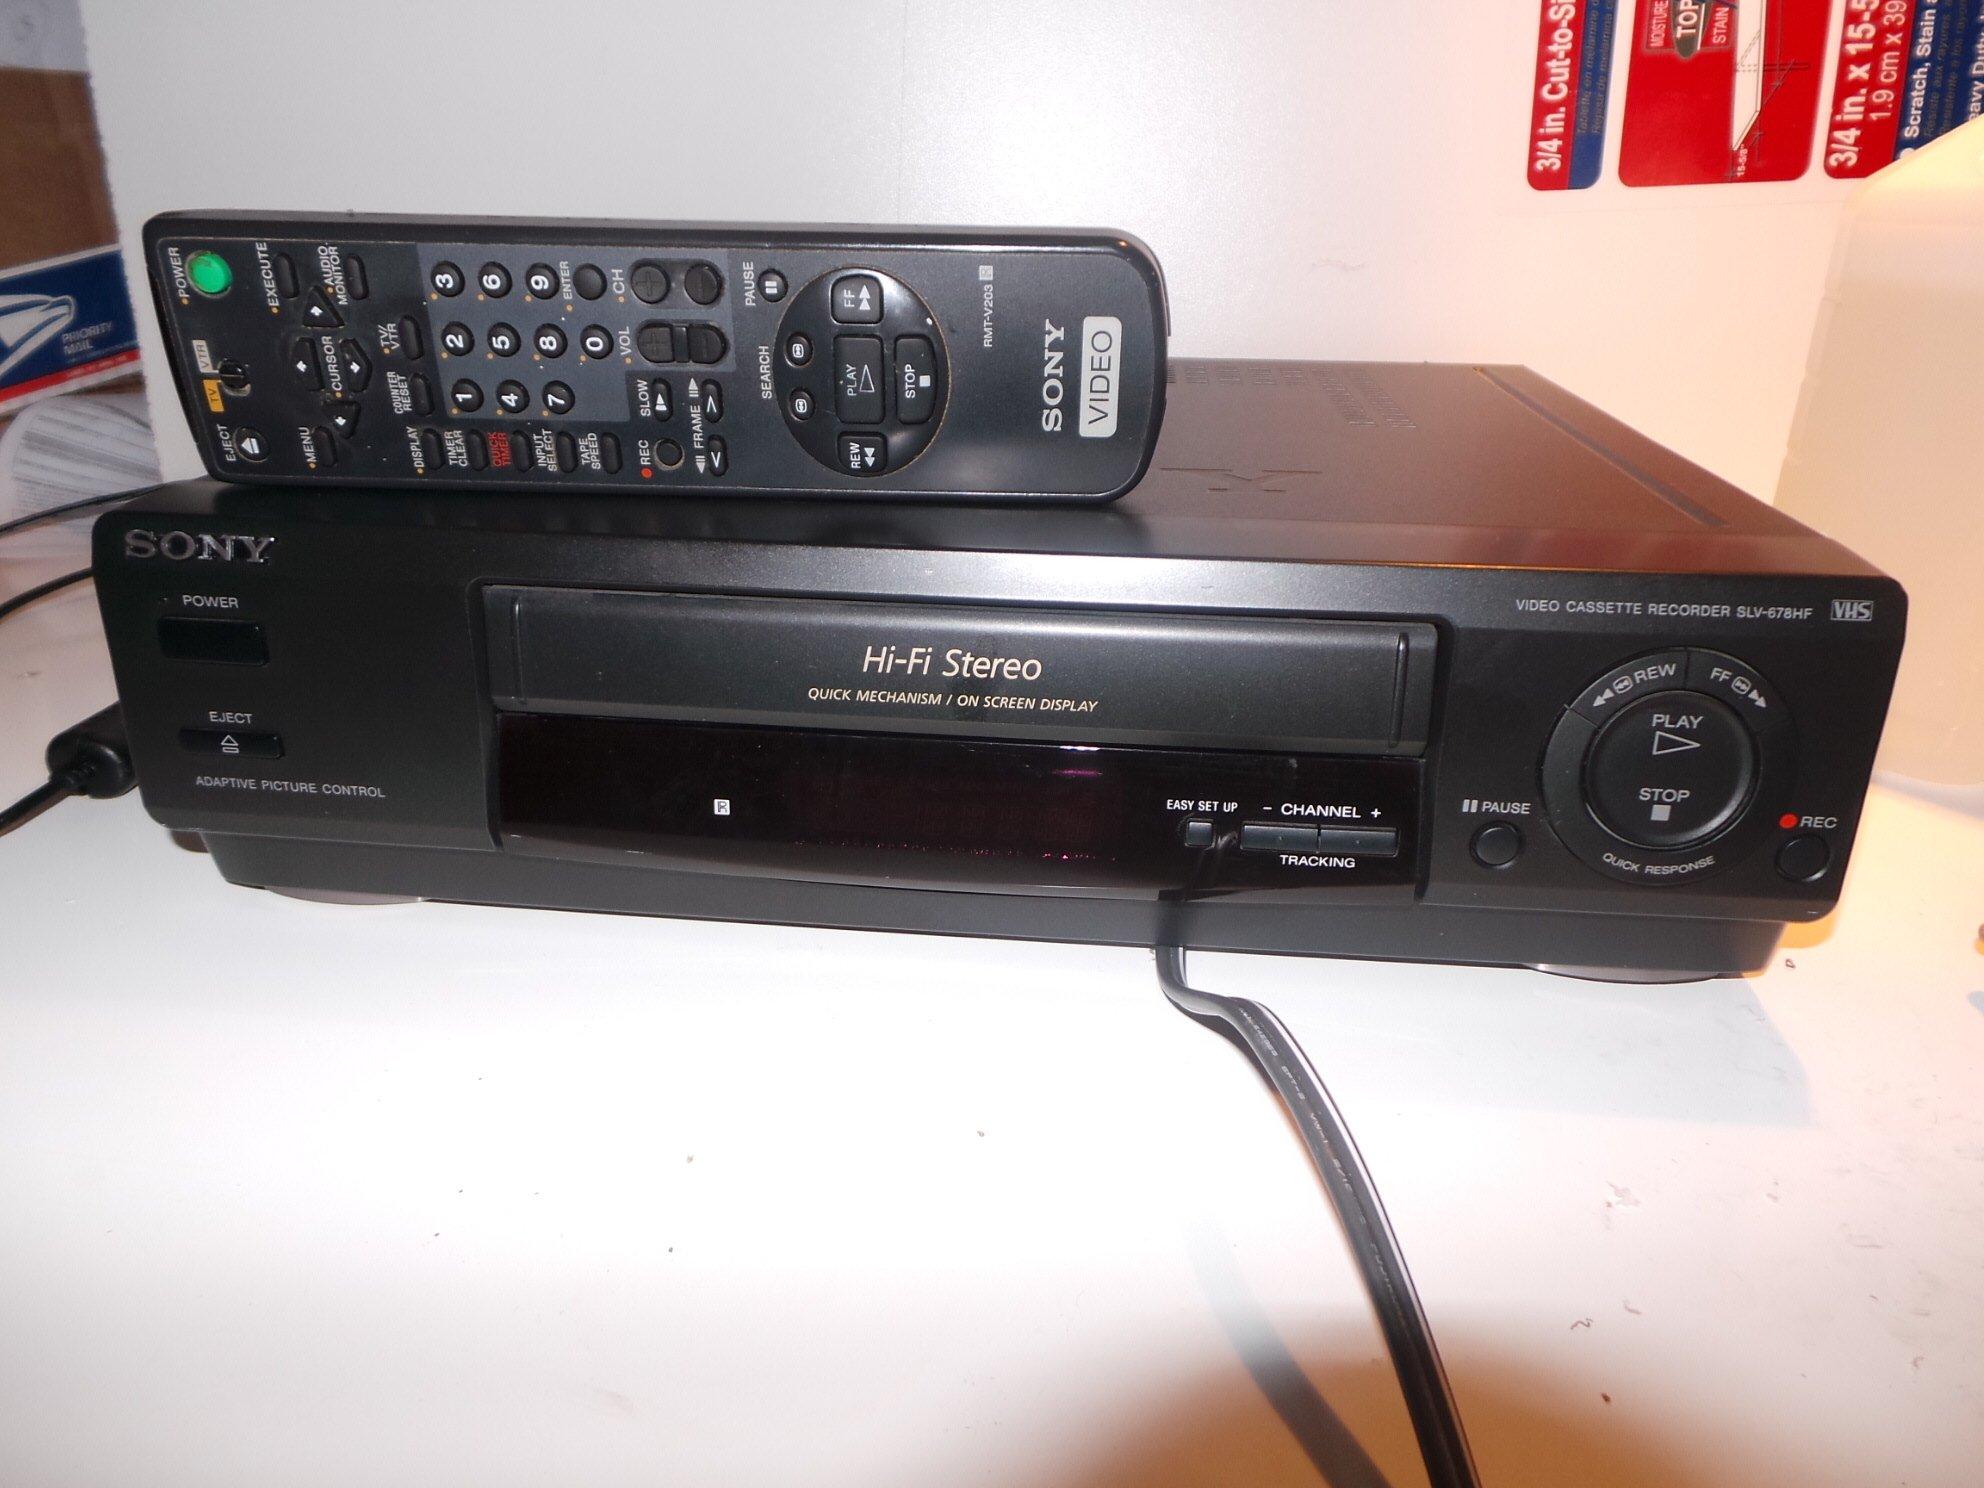 Sony Slv-678hf, Hi-fi Stereo,quick Mechanism, on Screen Display, Player & Recorder